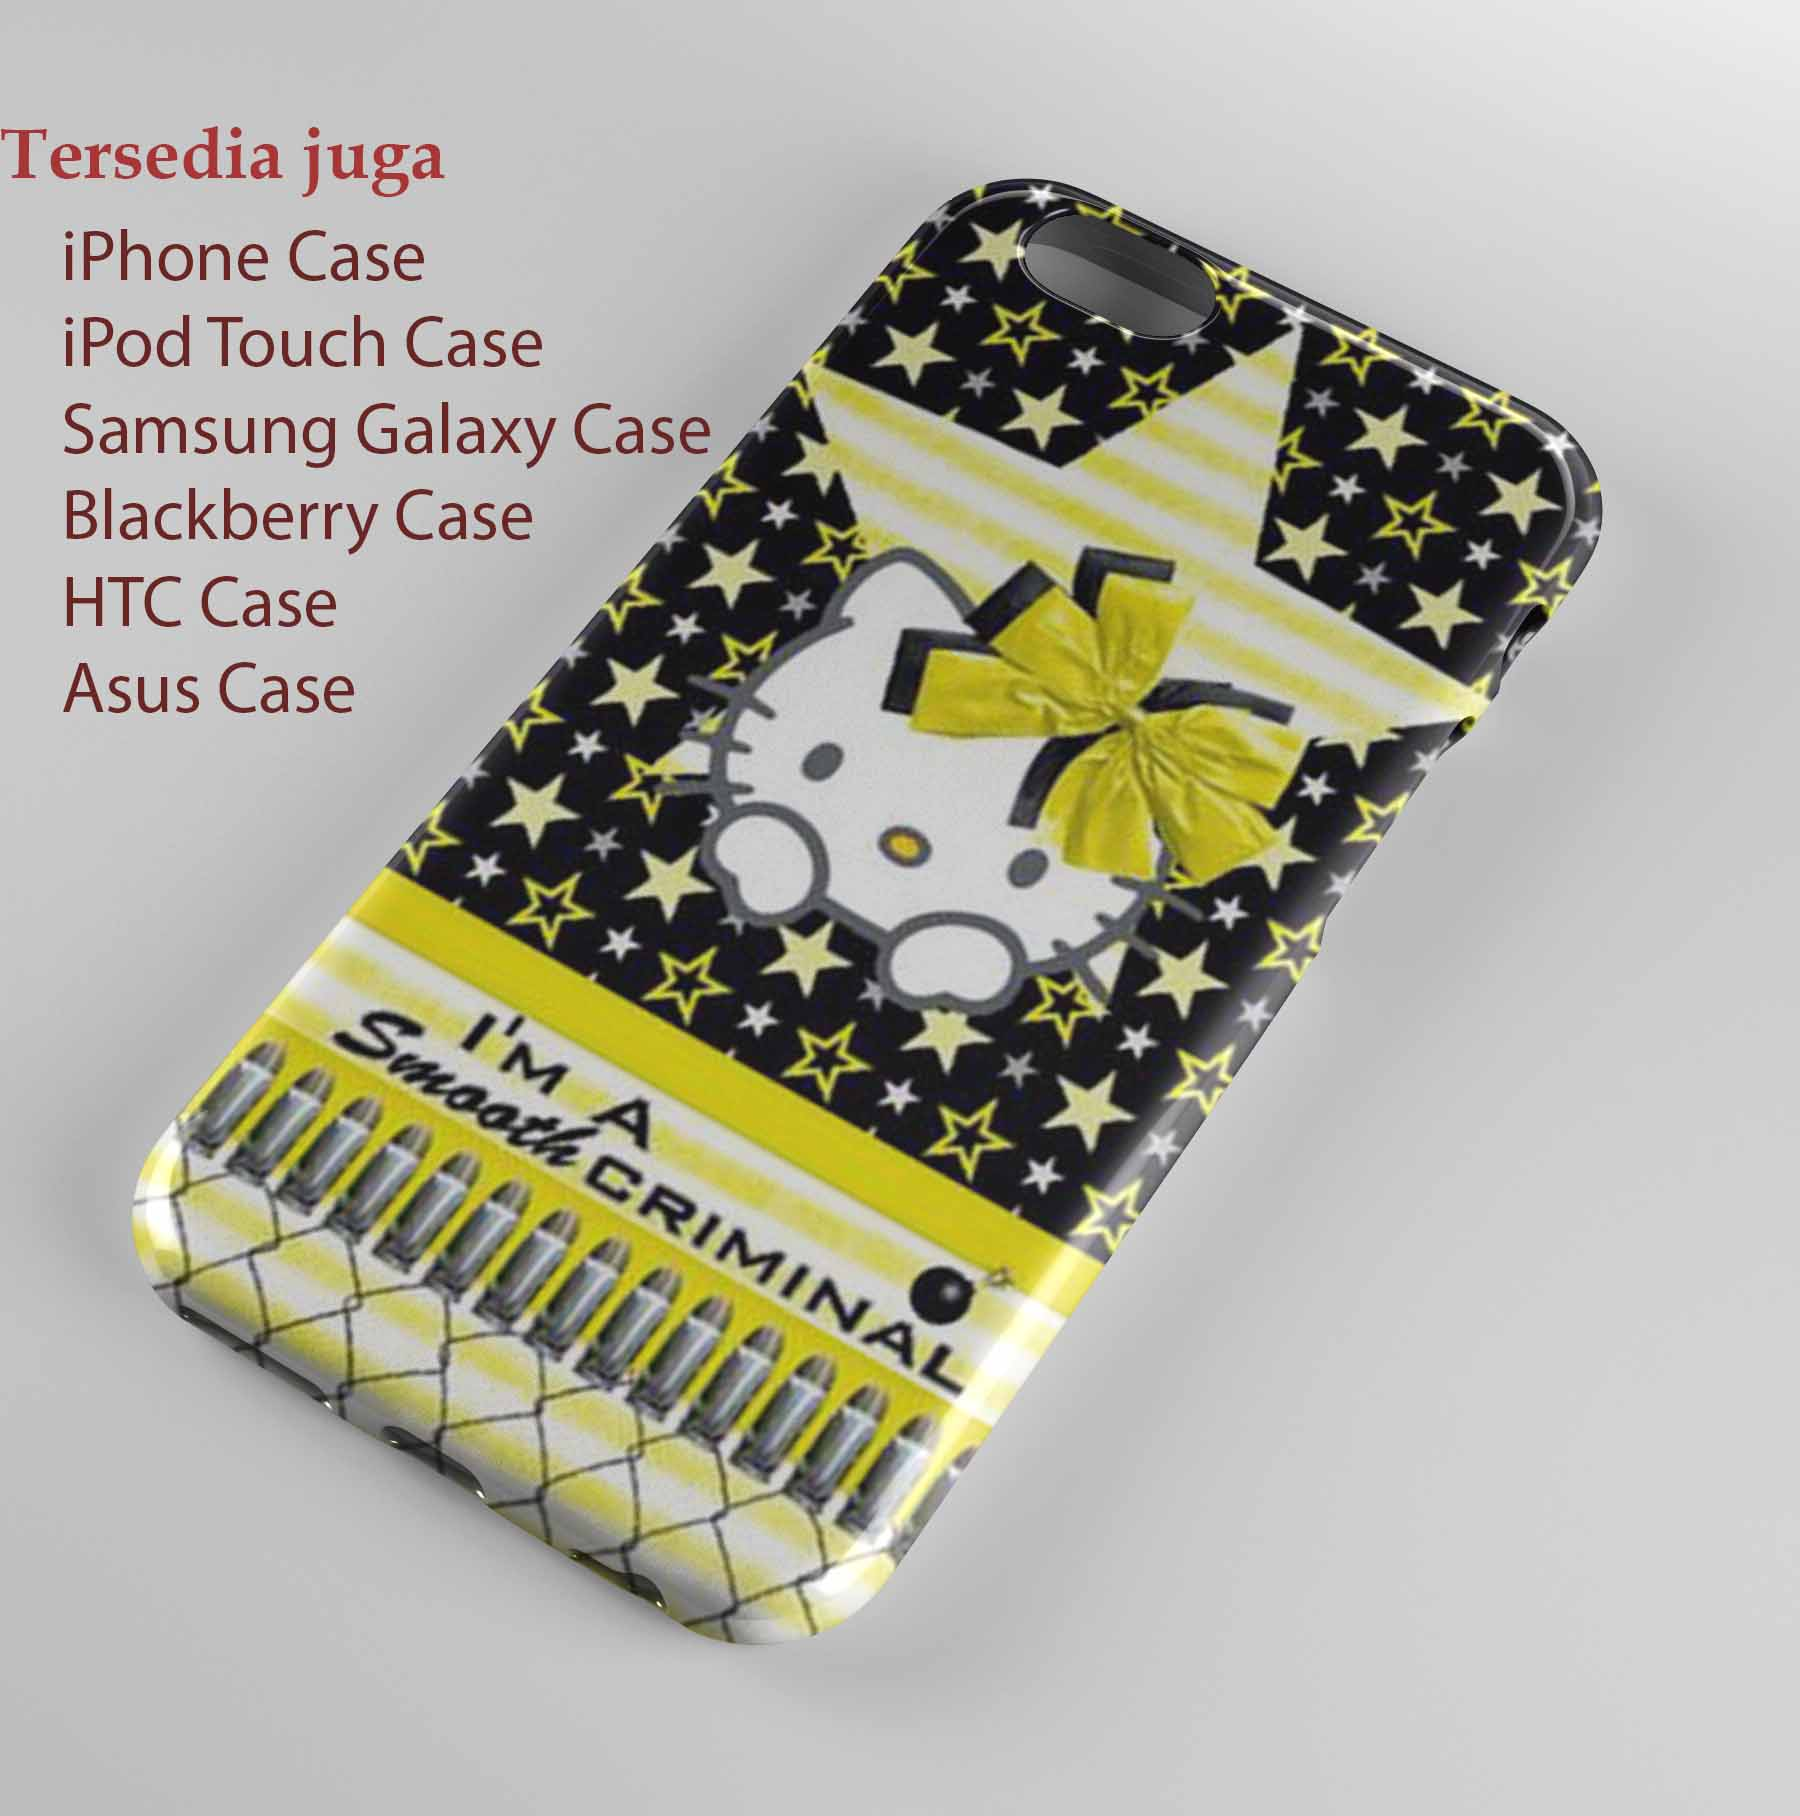 Top Wallpaper Hello Kitty Ipod Touch - 4686876_dc2b72cc-ad4d-4c25-9310-acb912aada61  Image_806913.jpg